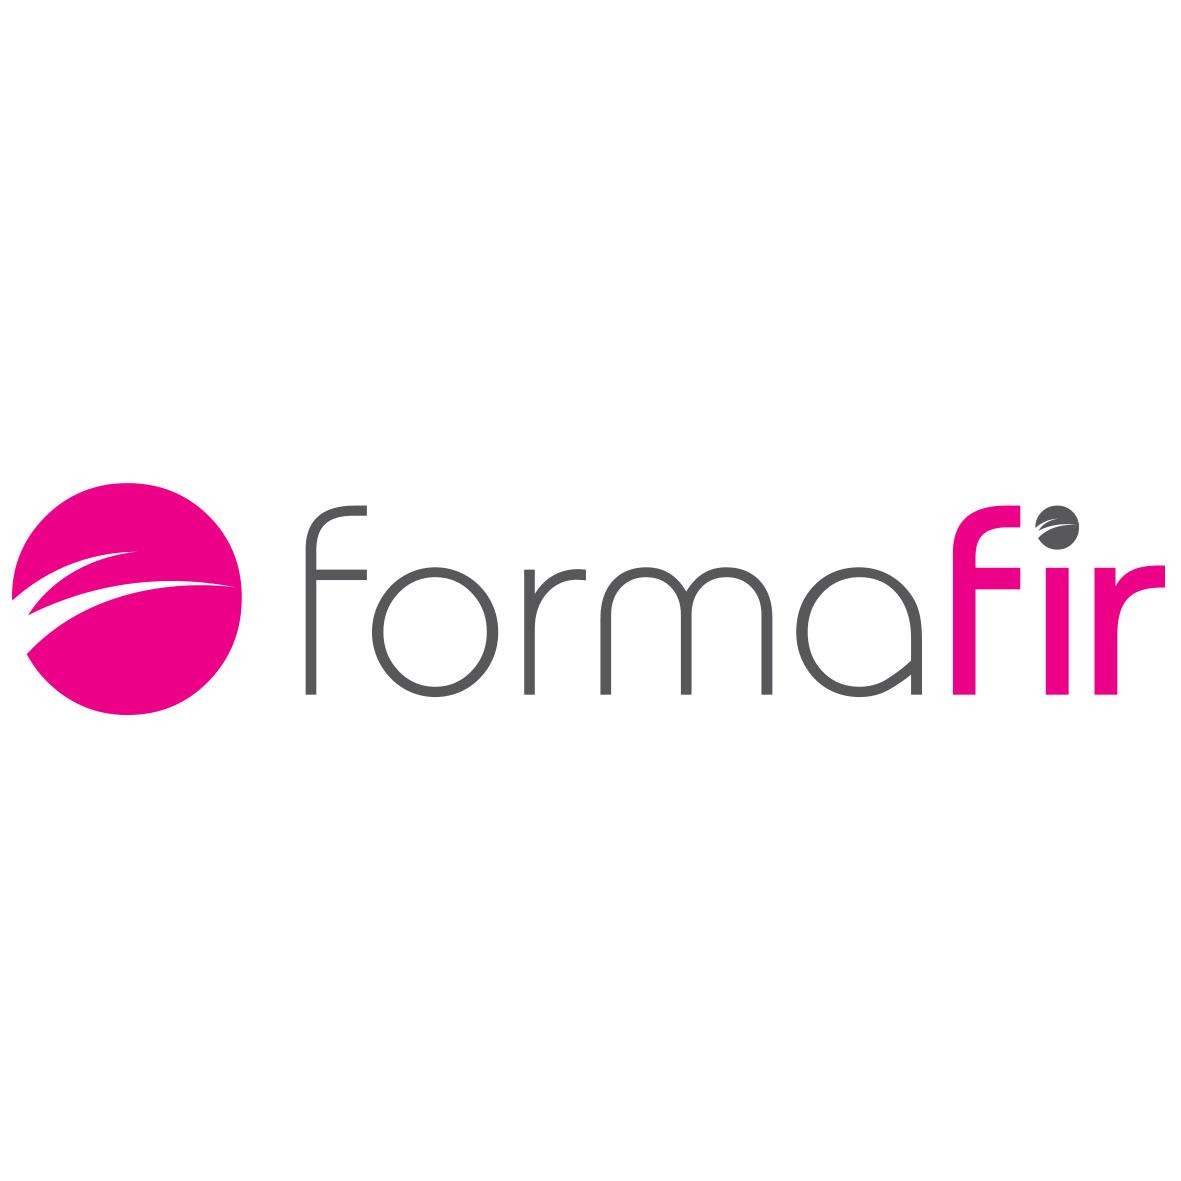 Formafir